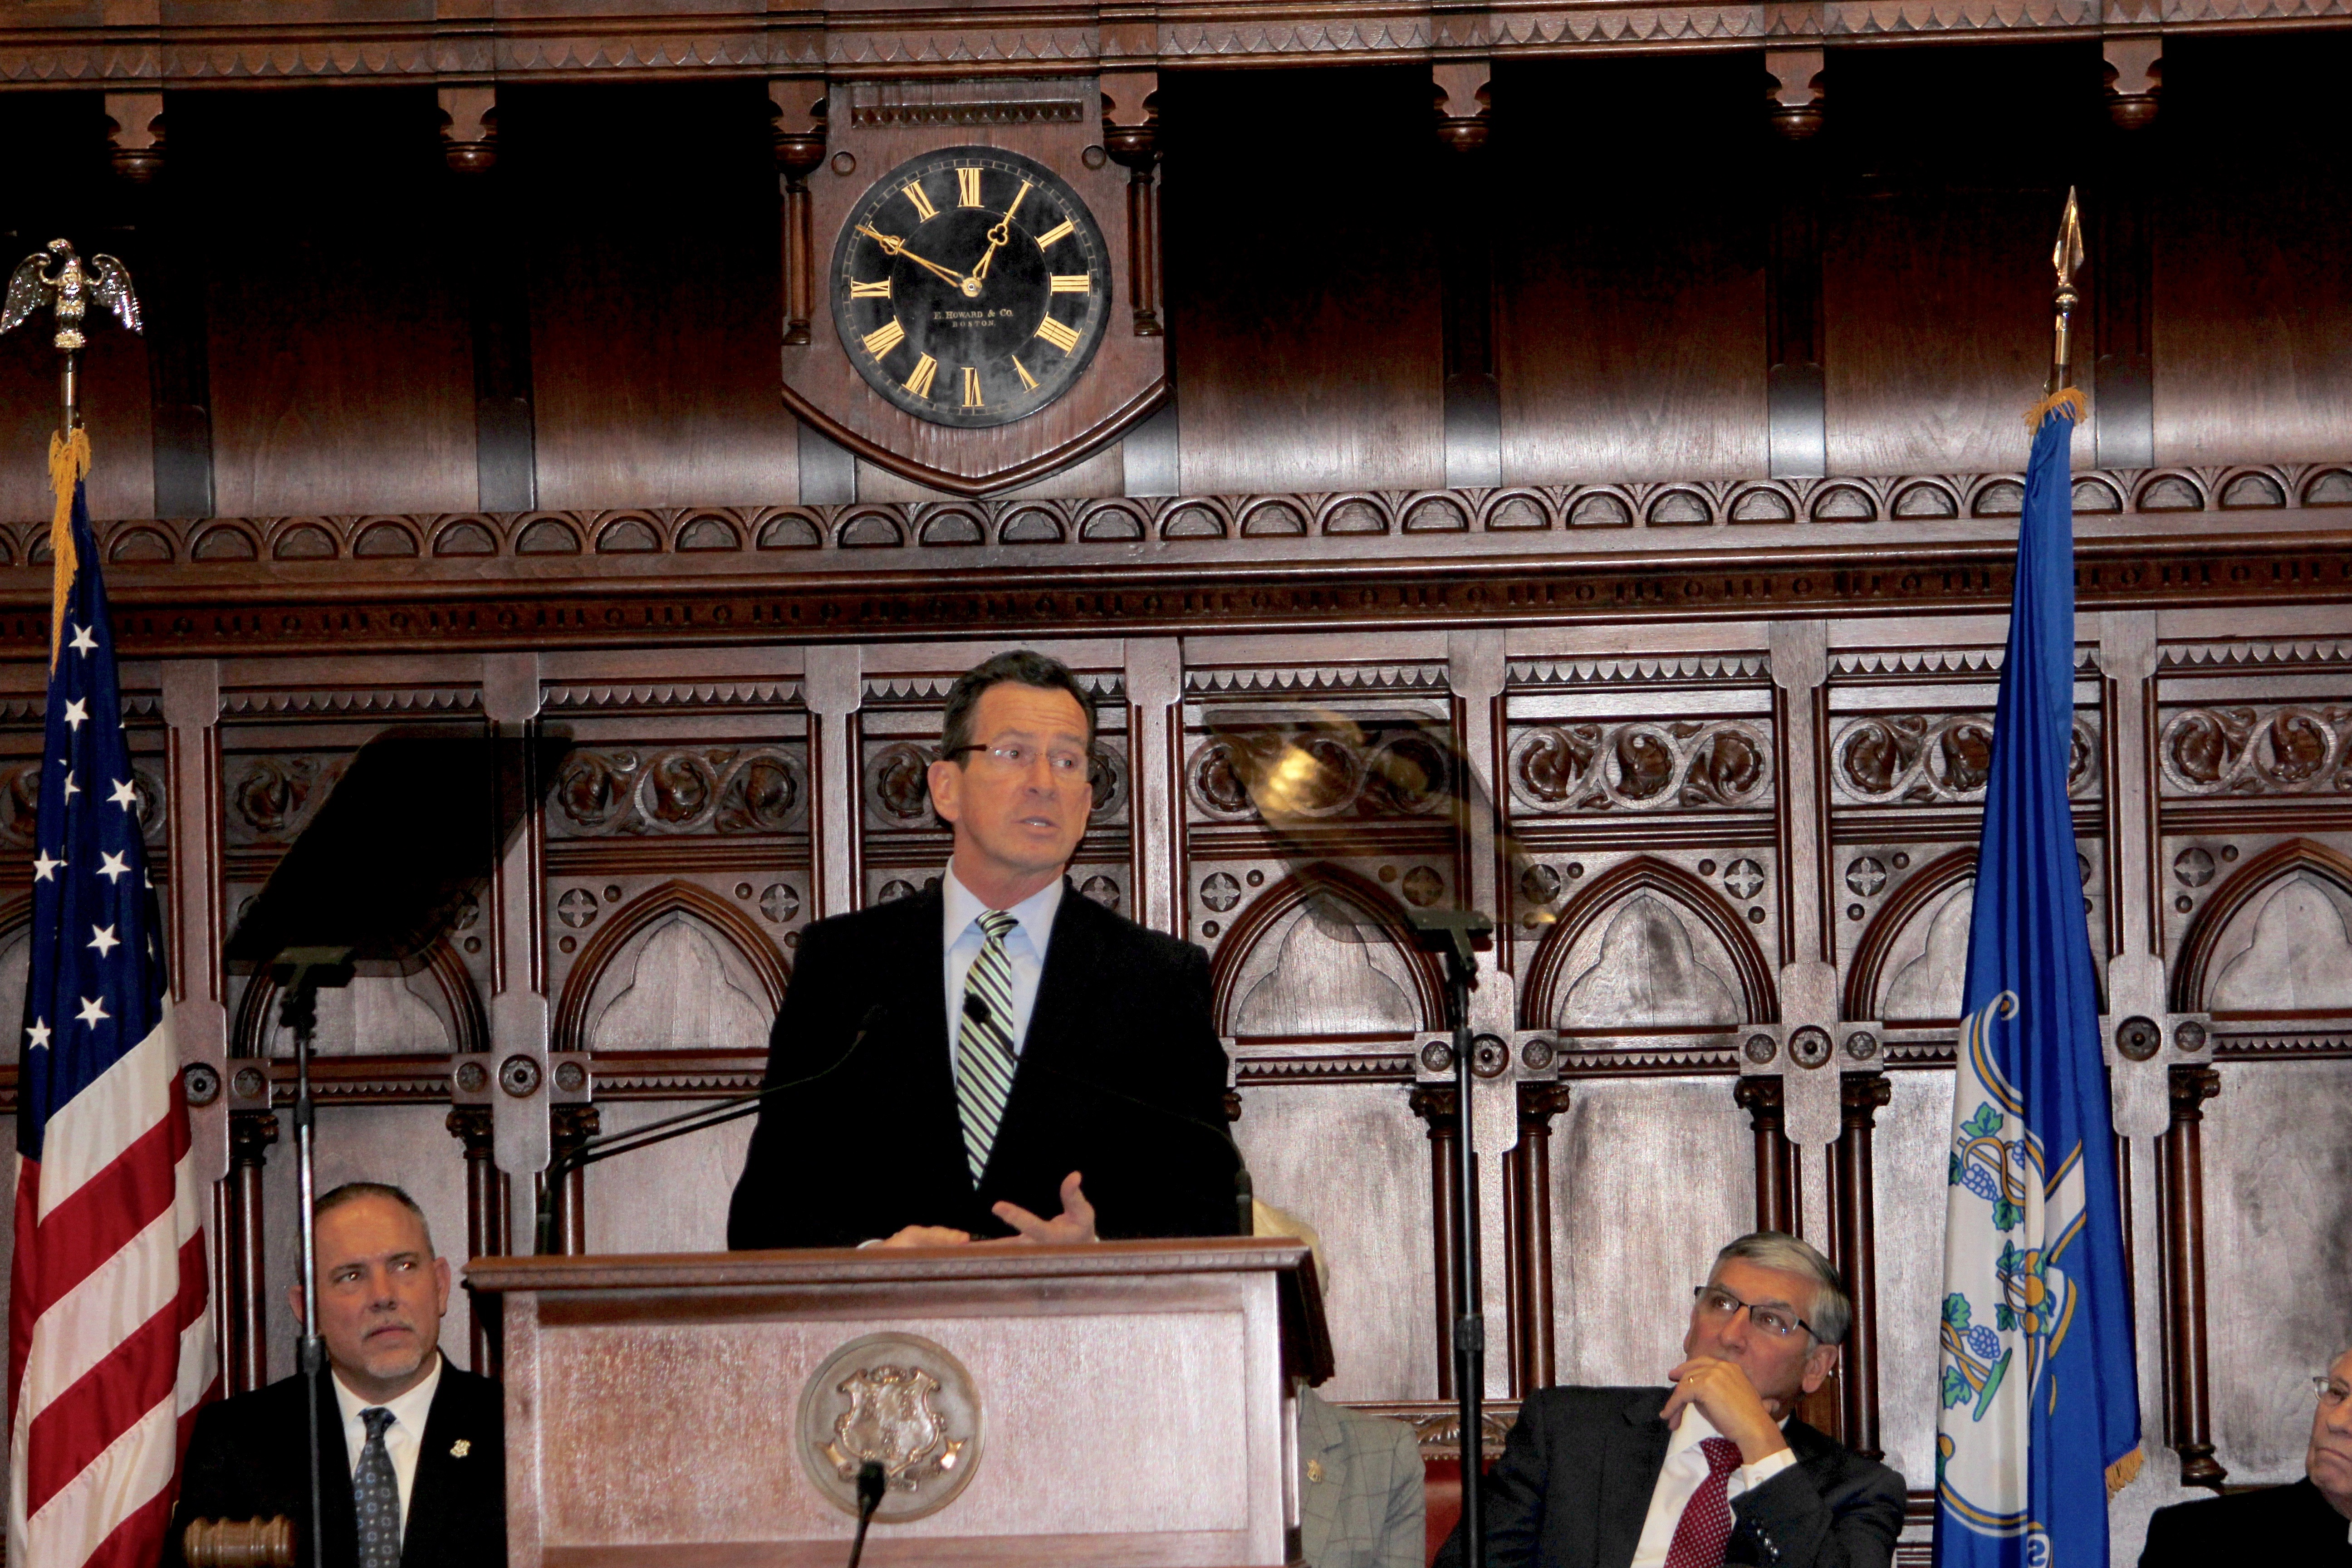 Malloy's new budget sparks big revenue debate